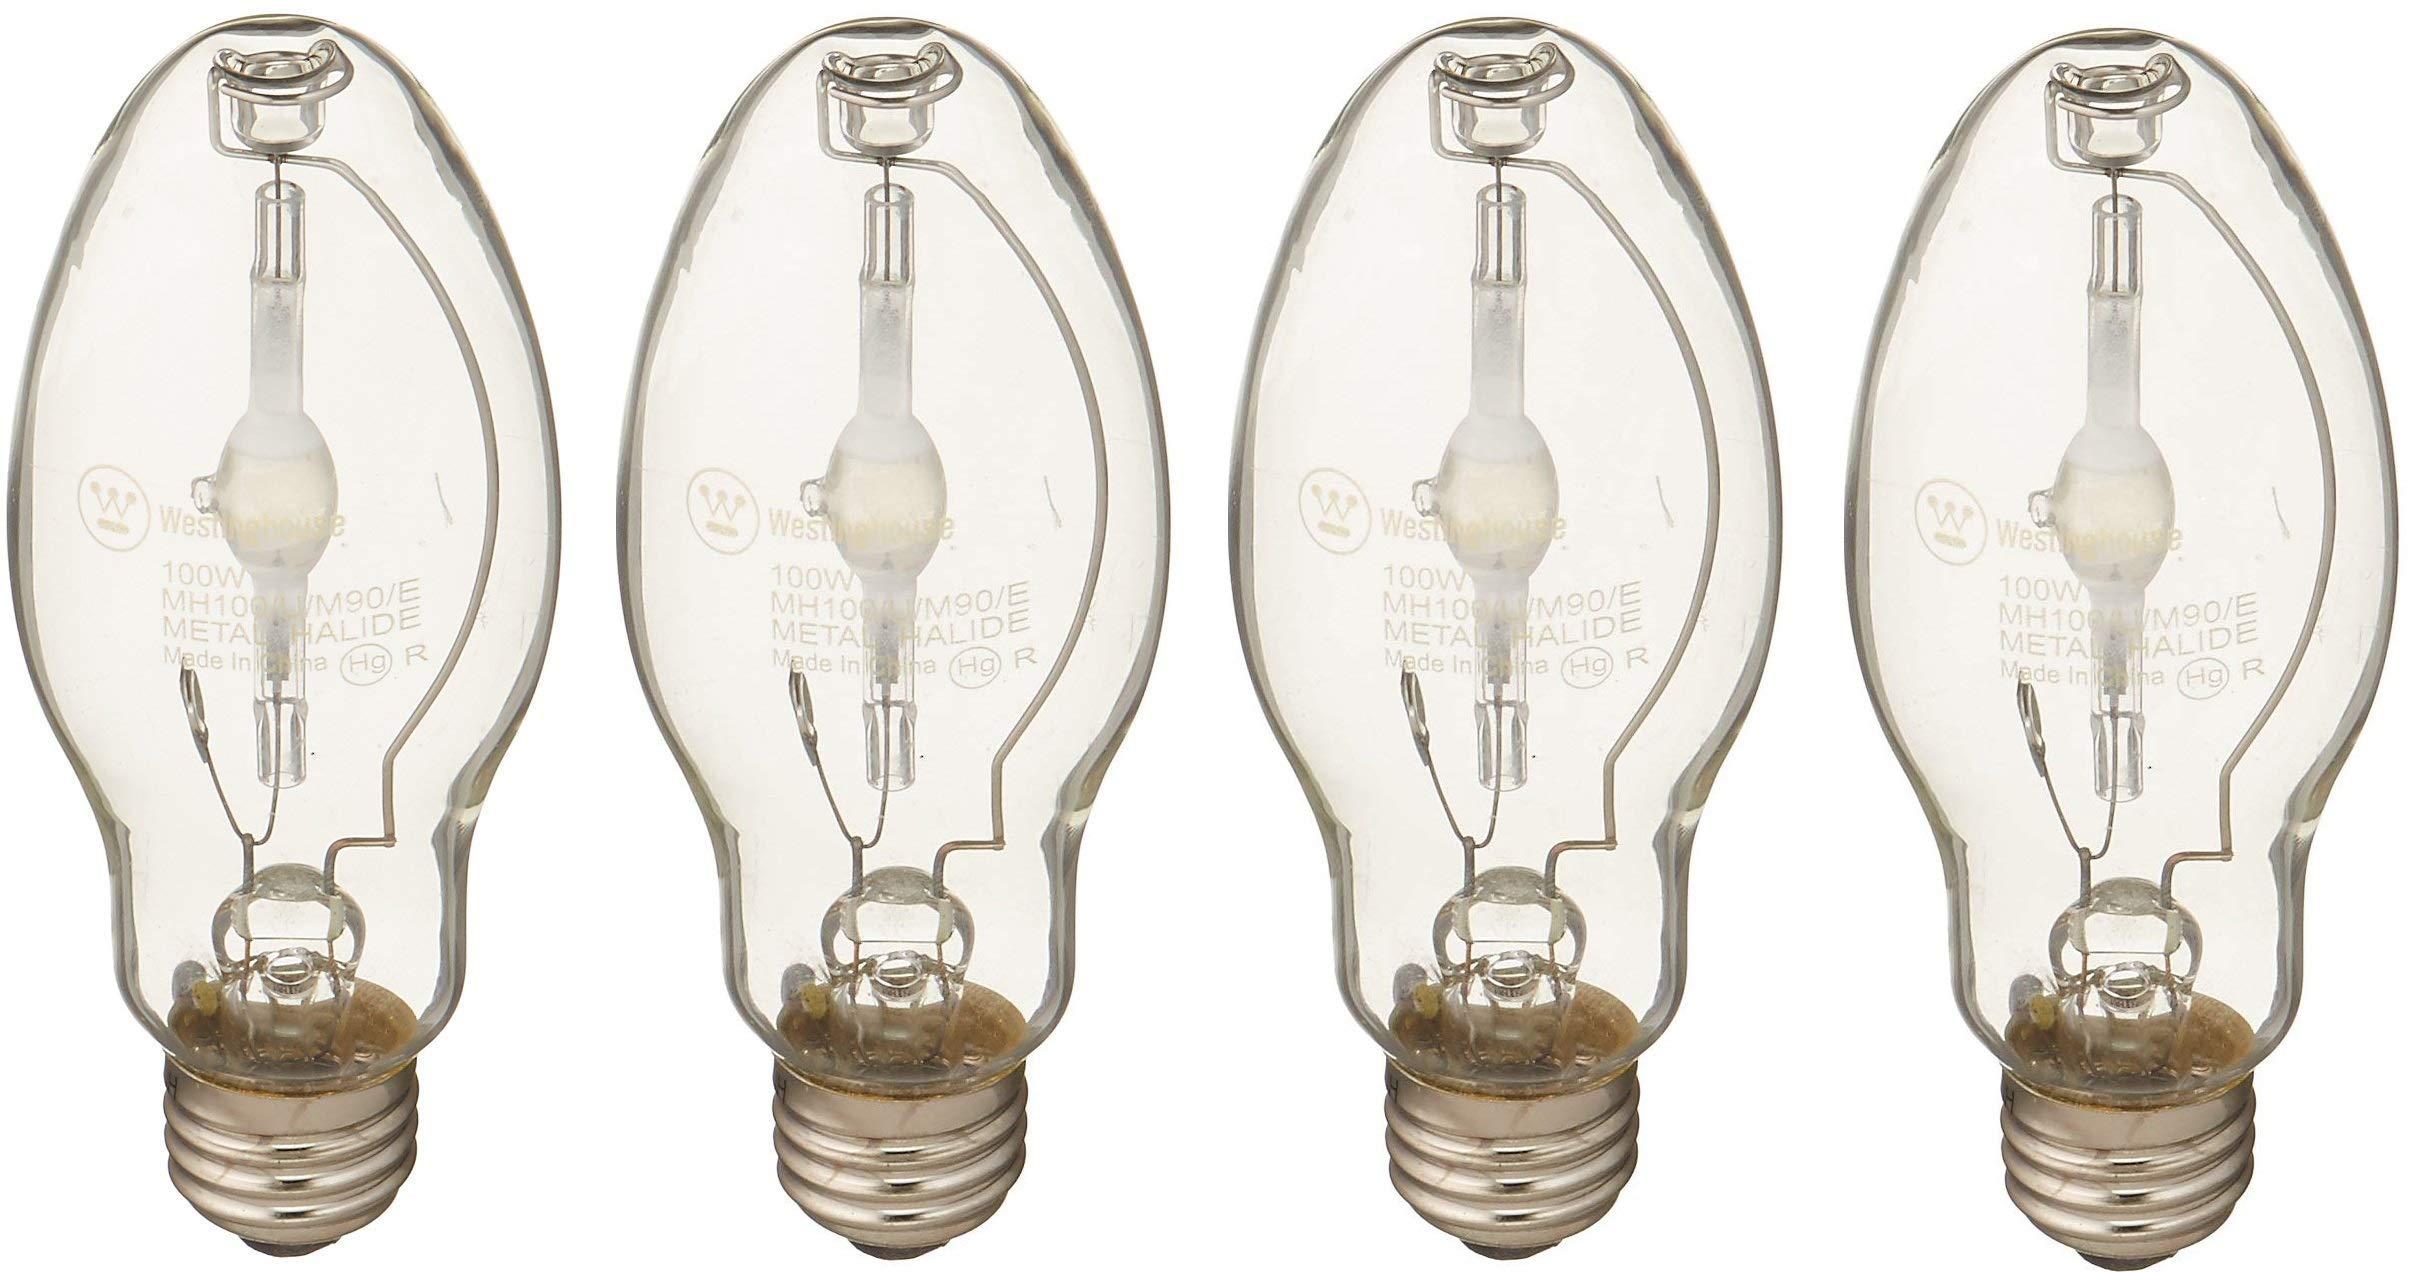 Westinghouse, 100 Watt E26 Medium Base, M90/E ANSI ED17 Metal Halide HID Light Bulb ... (4 Pack)